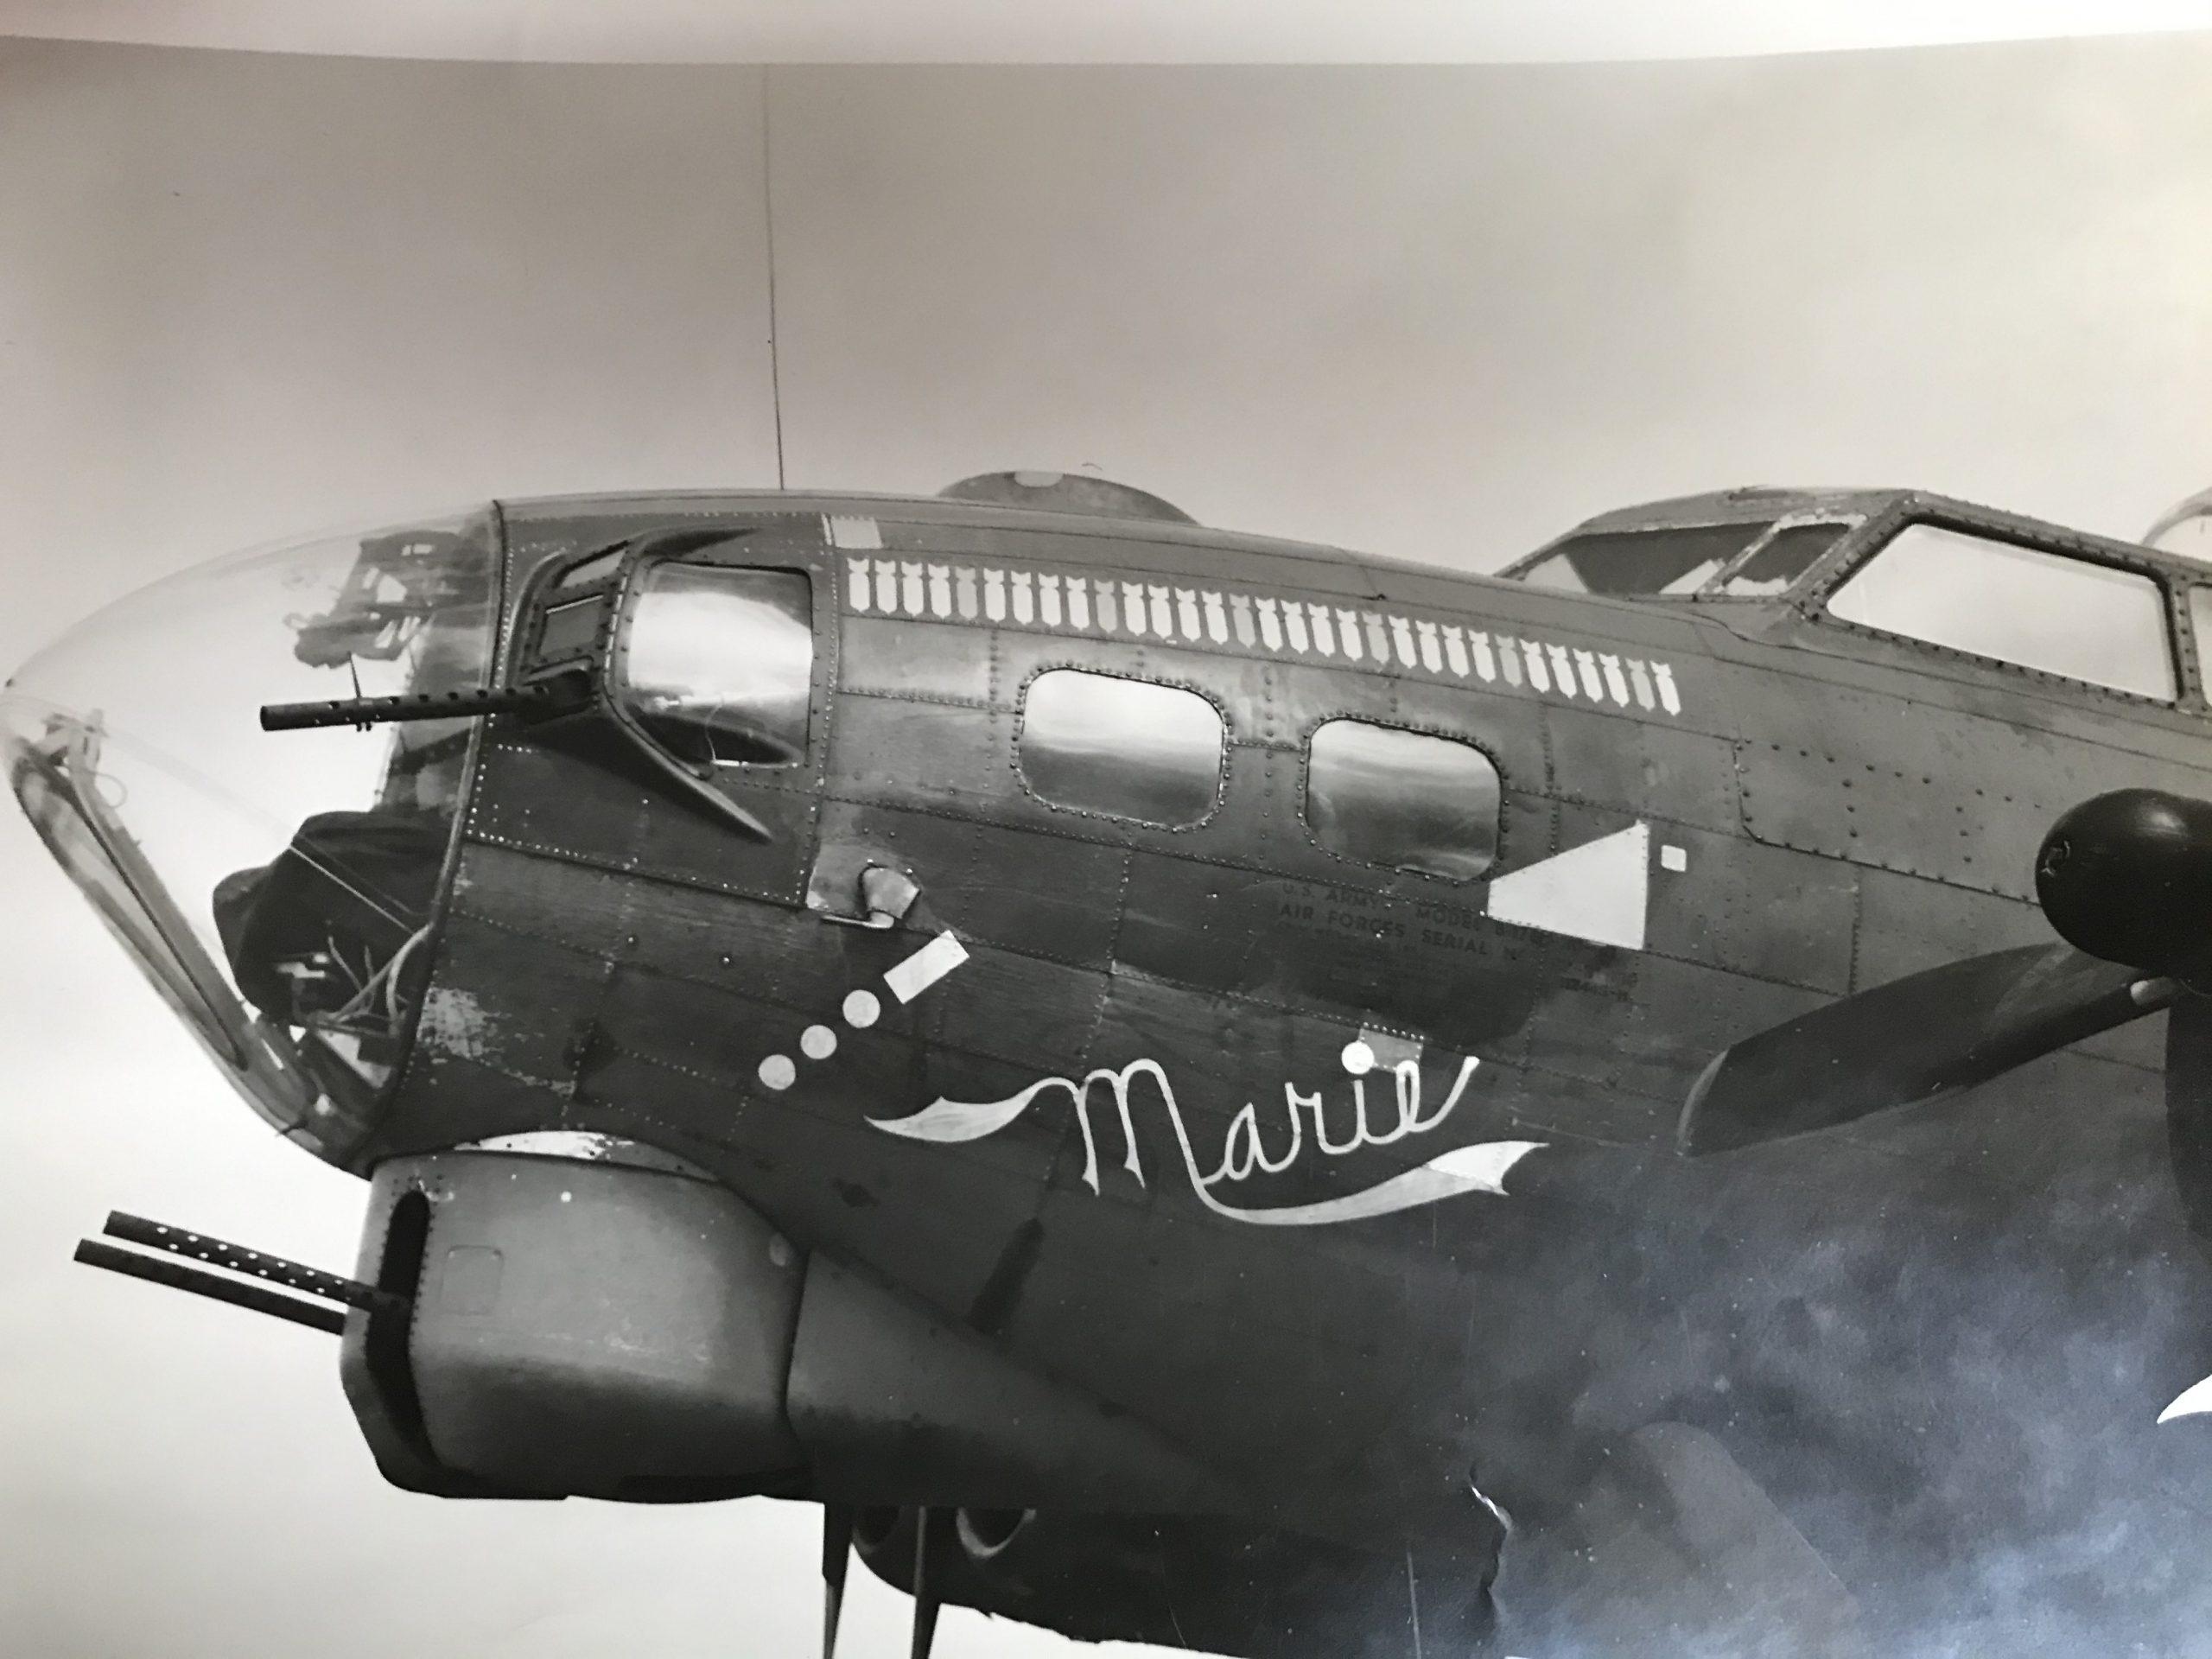 B-17 #42-31830 / Marie